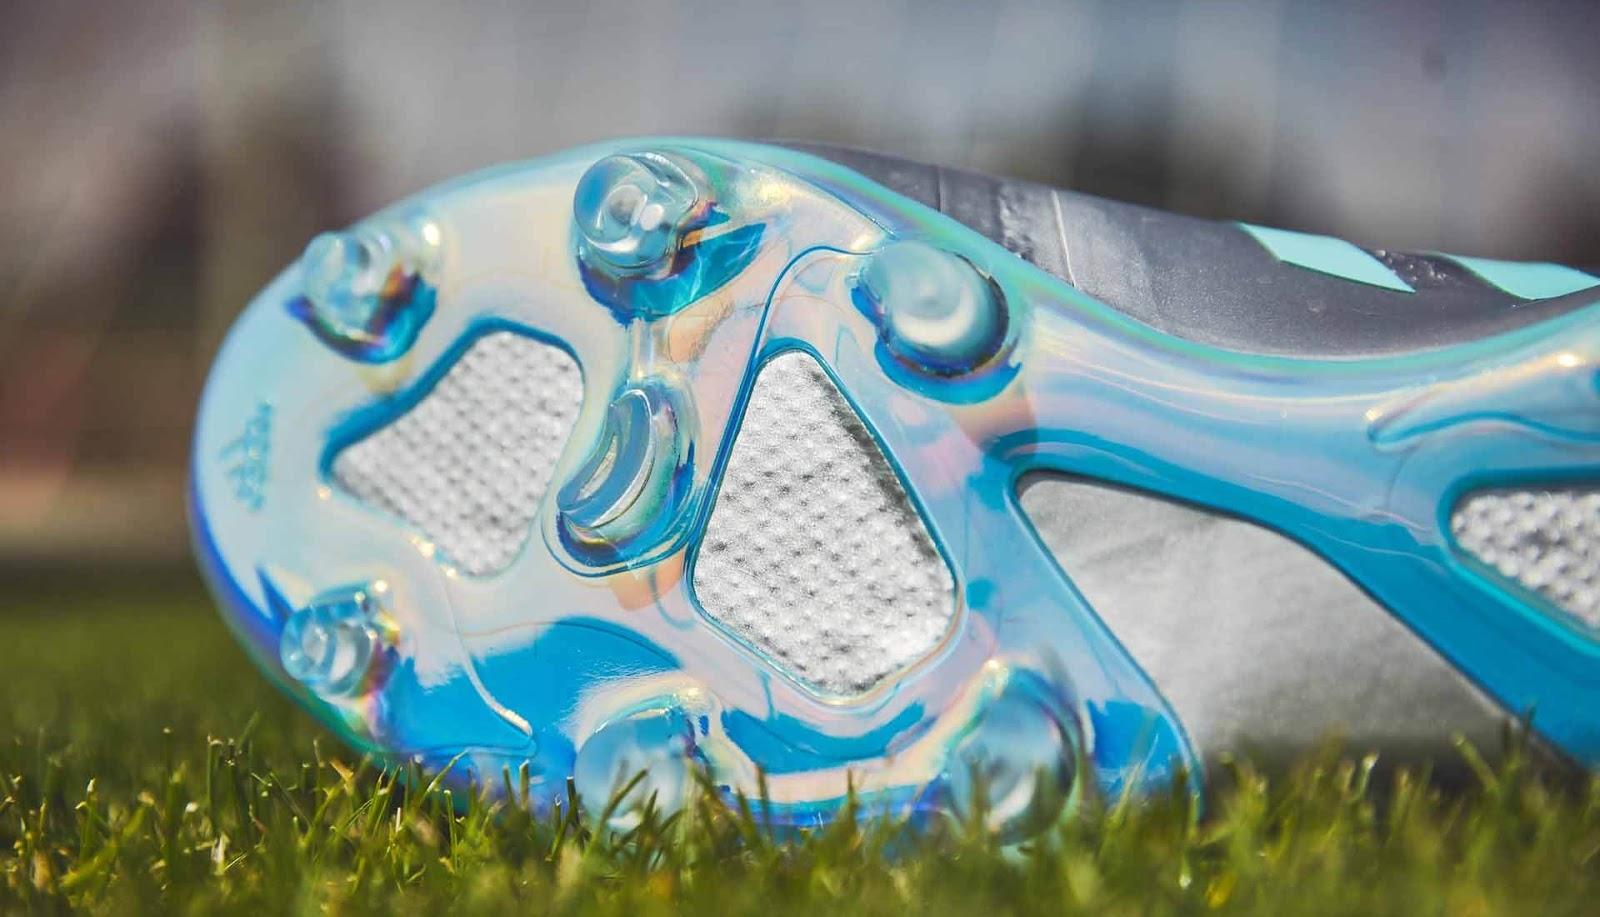 Frozen Water  Adidas Glitch Fluido Skin Released - cheap soccer cleats 70c94a82faf